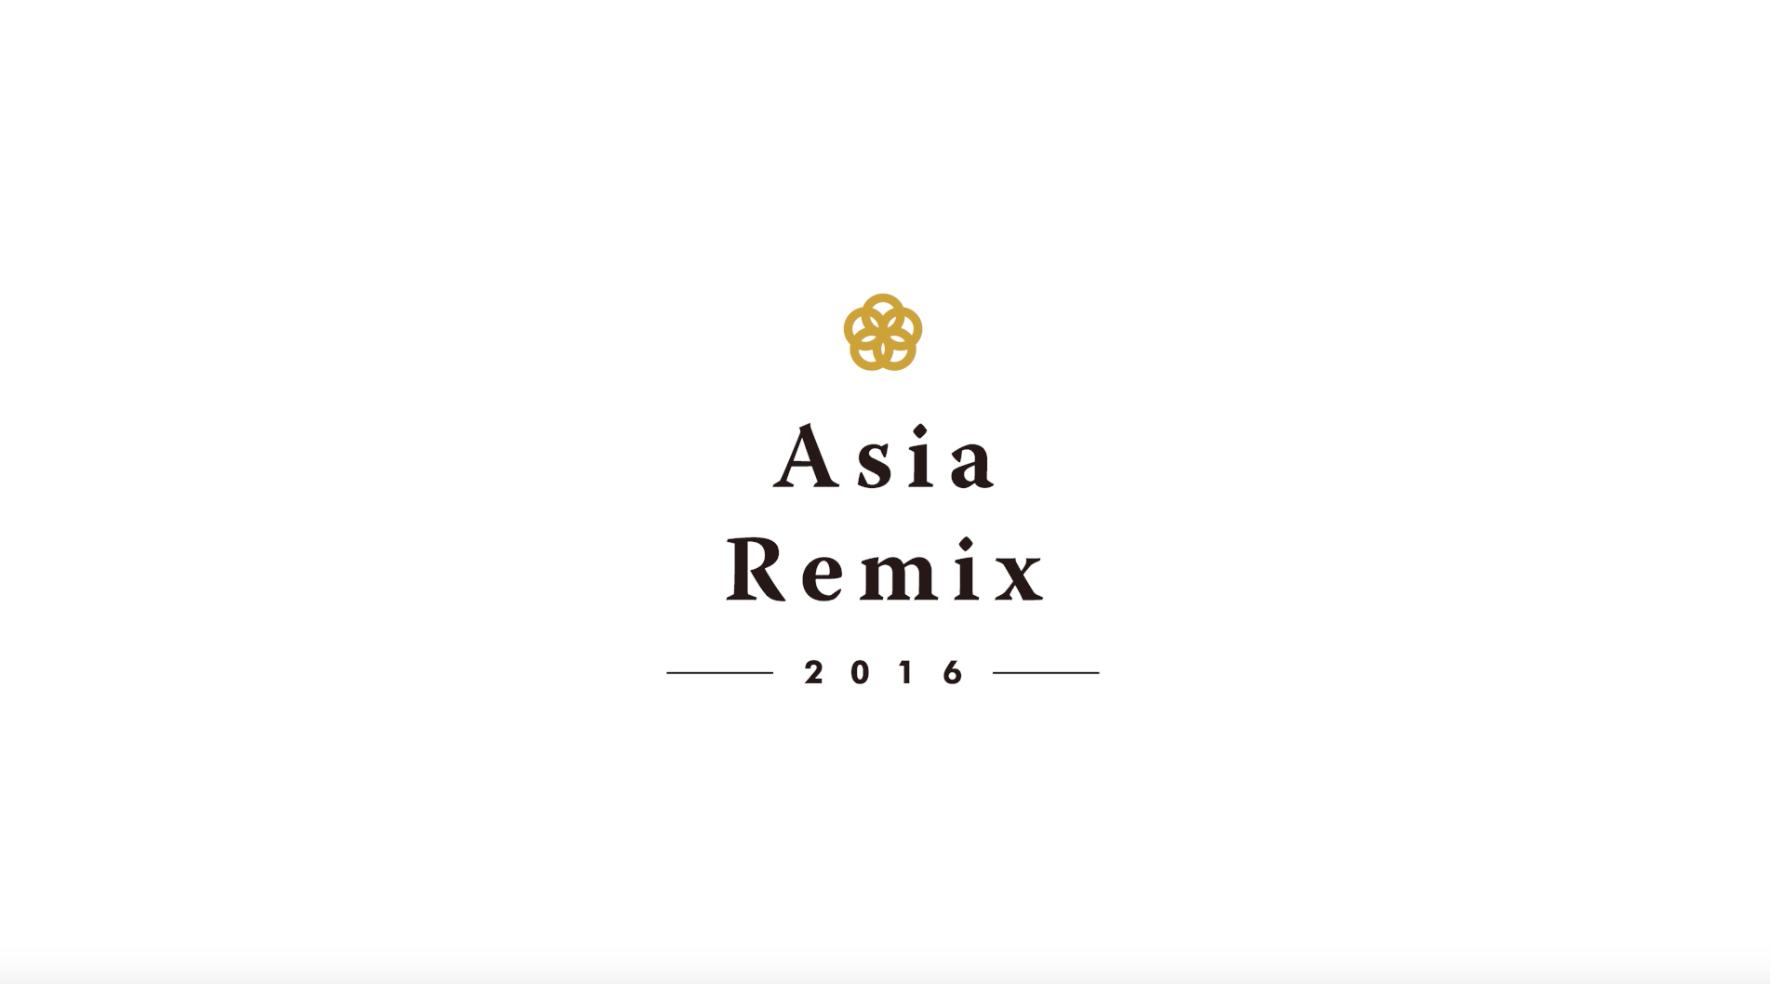 Asia Remix 2016